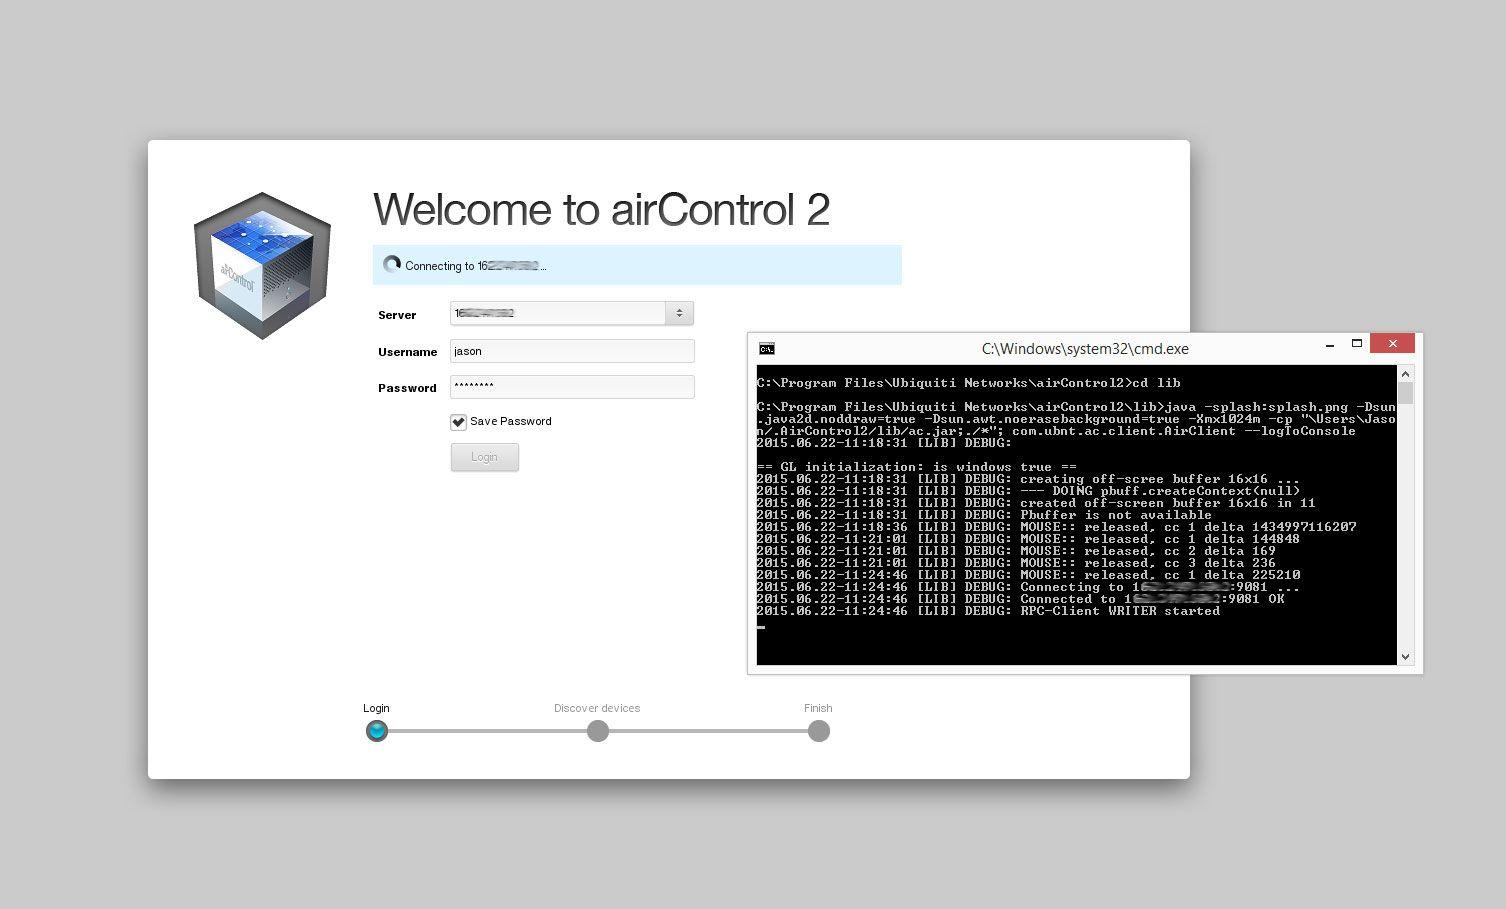 Aircontrol 2 Windows client issue | Ubiquiti Community